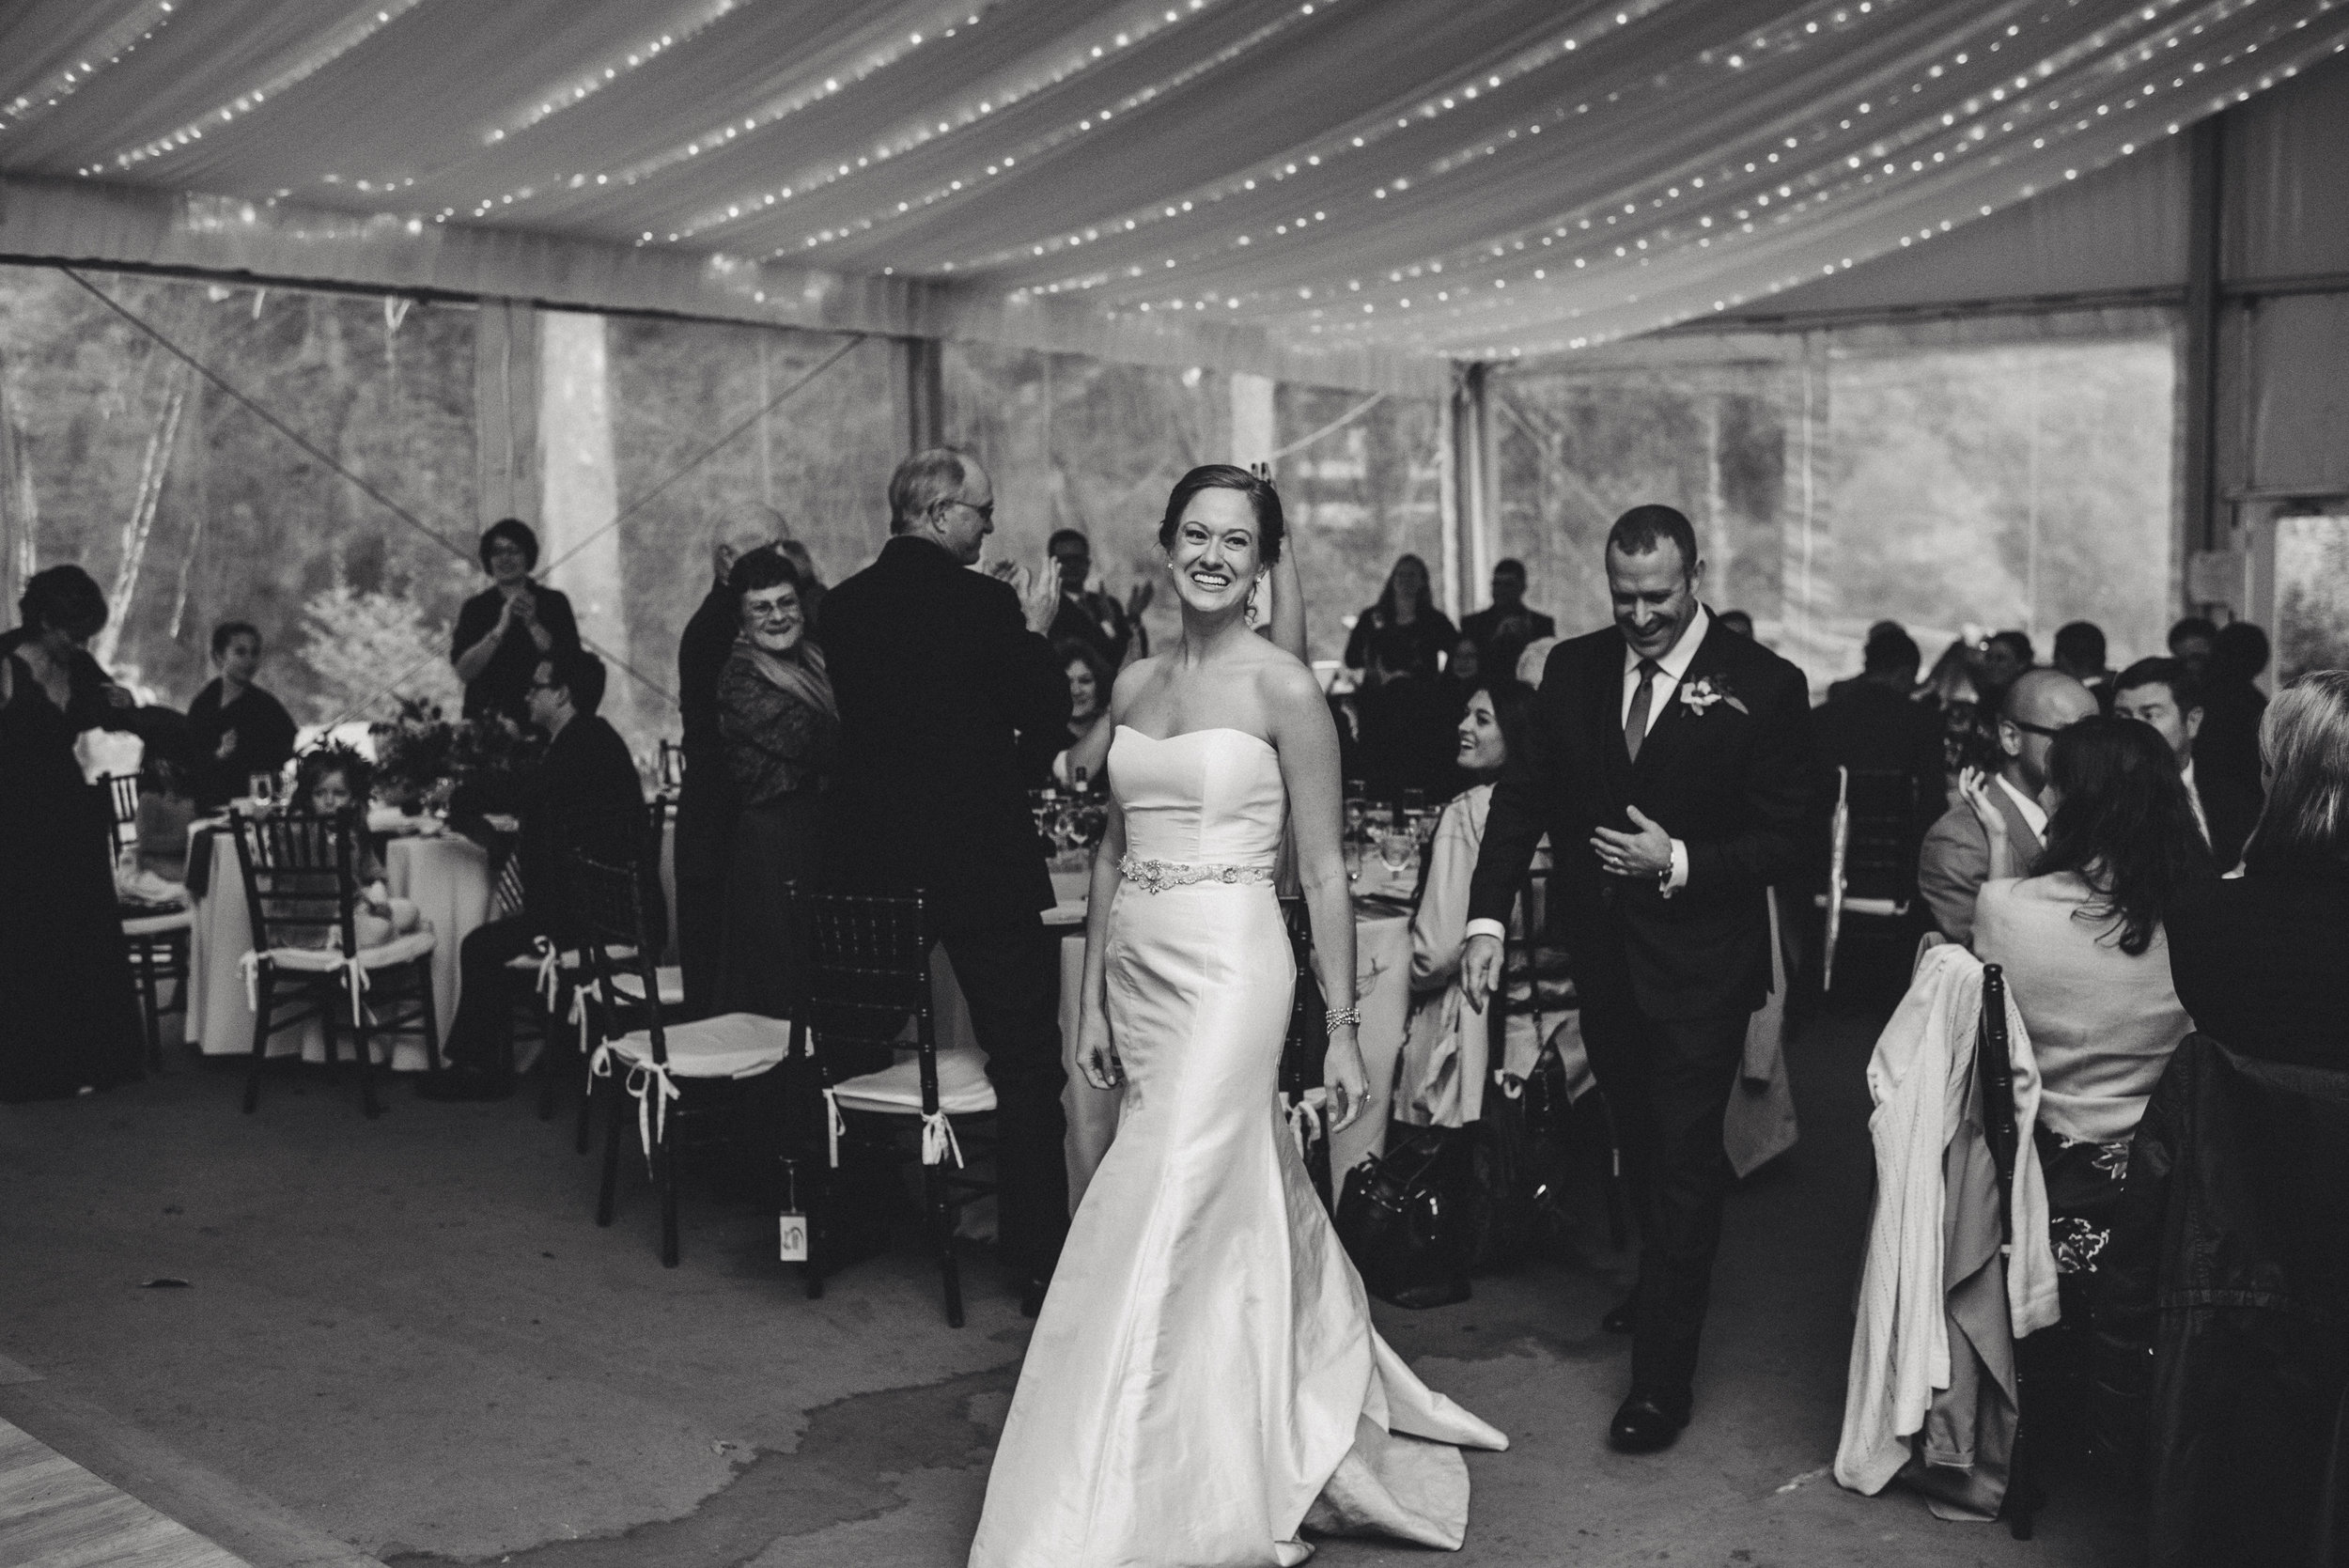 JACQUELINE & ANDREW WARSHAWER -BROOKMILL FARM FALL WEDDING - INTIMATE WEDDING PHOTOGRAPHER - TWOTWENTY by CHI-CHI AGBIM-459.jpg